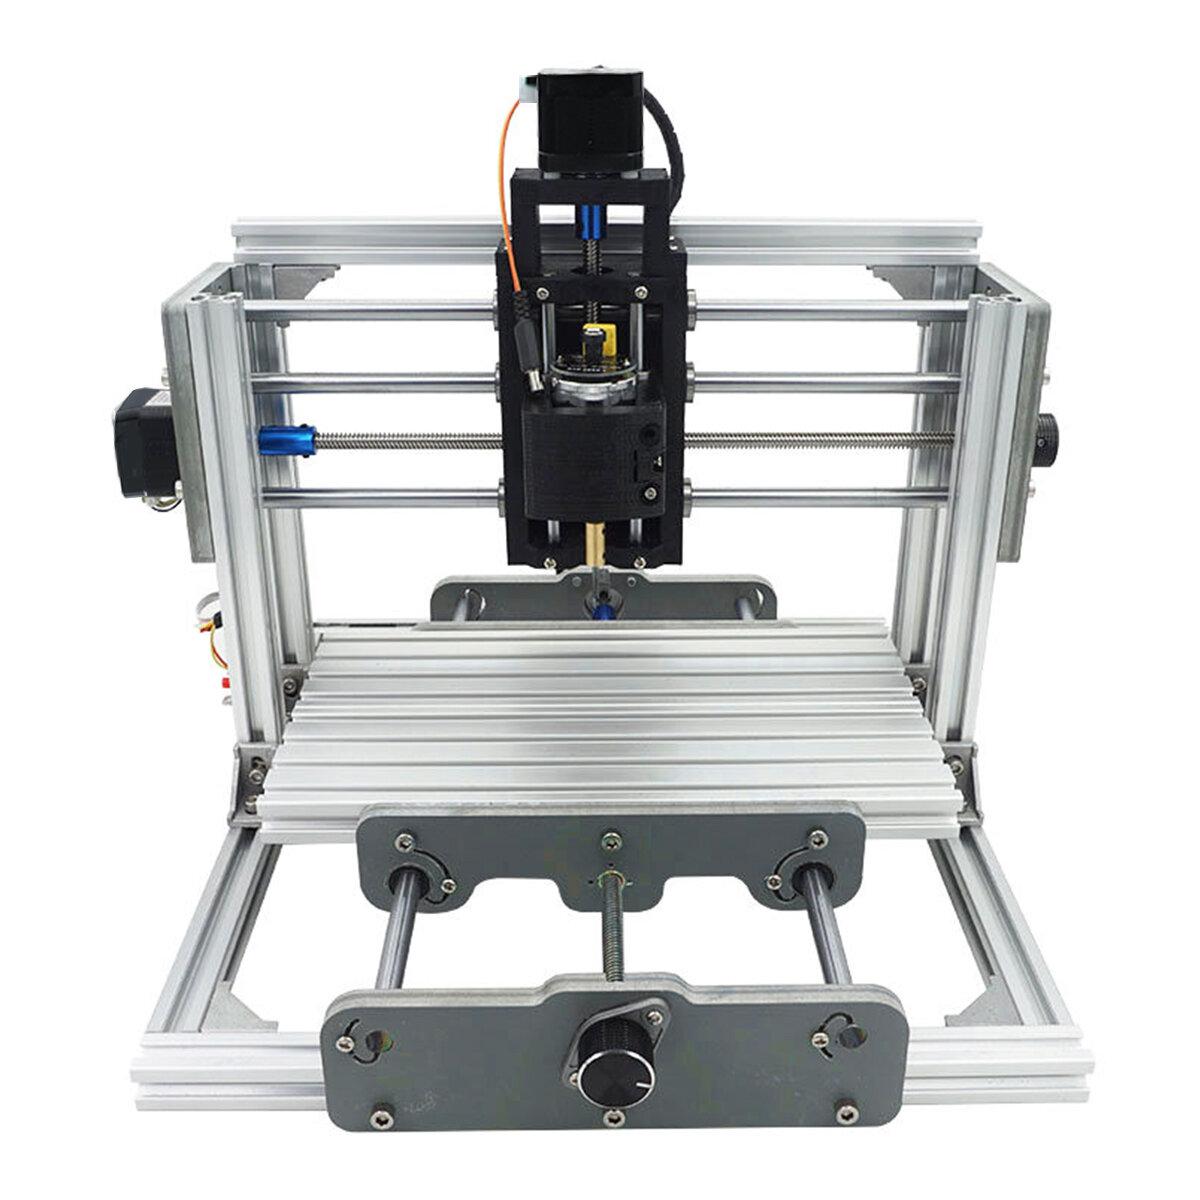 2417 3 Axis Mini DIY CNC Router Wood Craving Engraving Cutting Milling  Desktop Engraver Machine 240x170x65mm